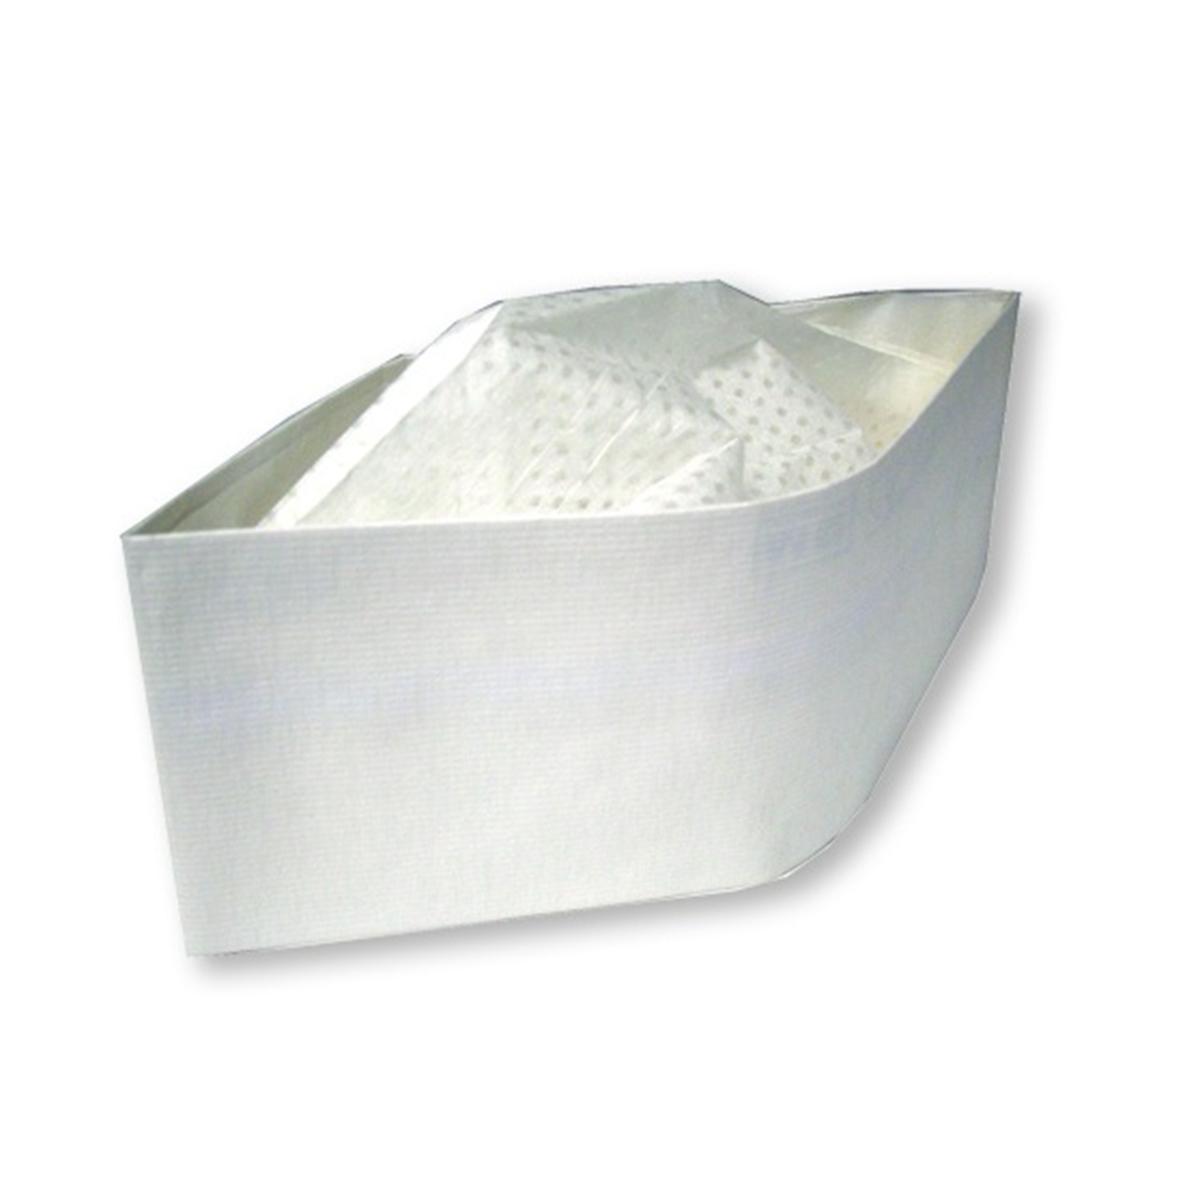 Disposable White Caps (50/box)